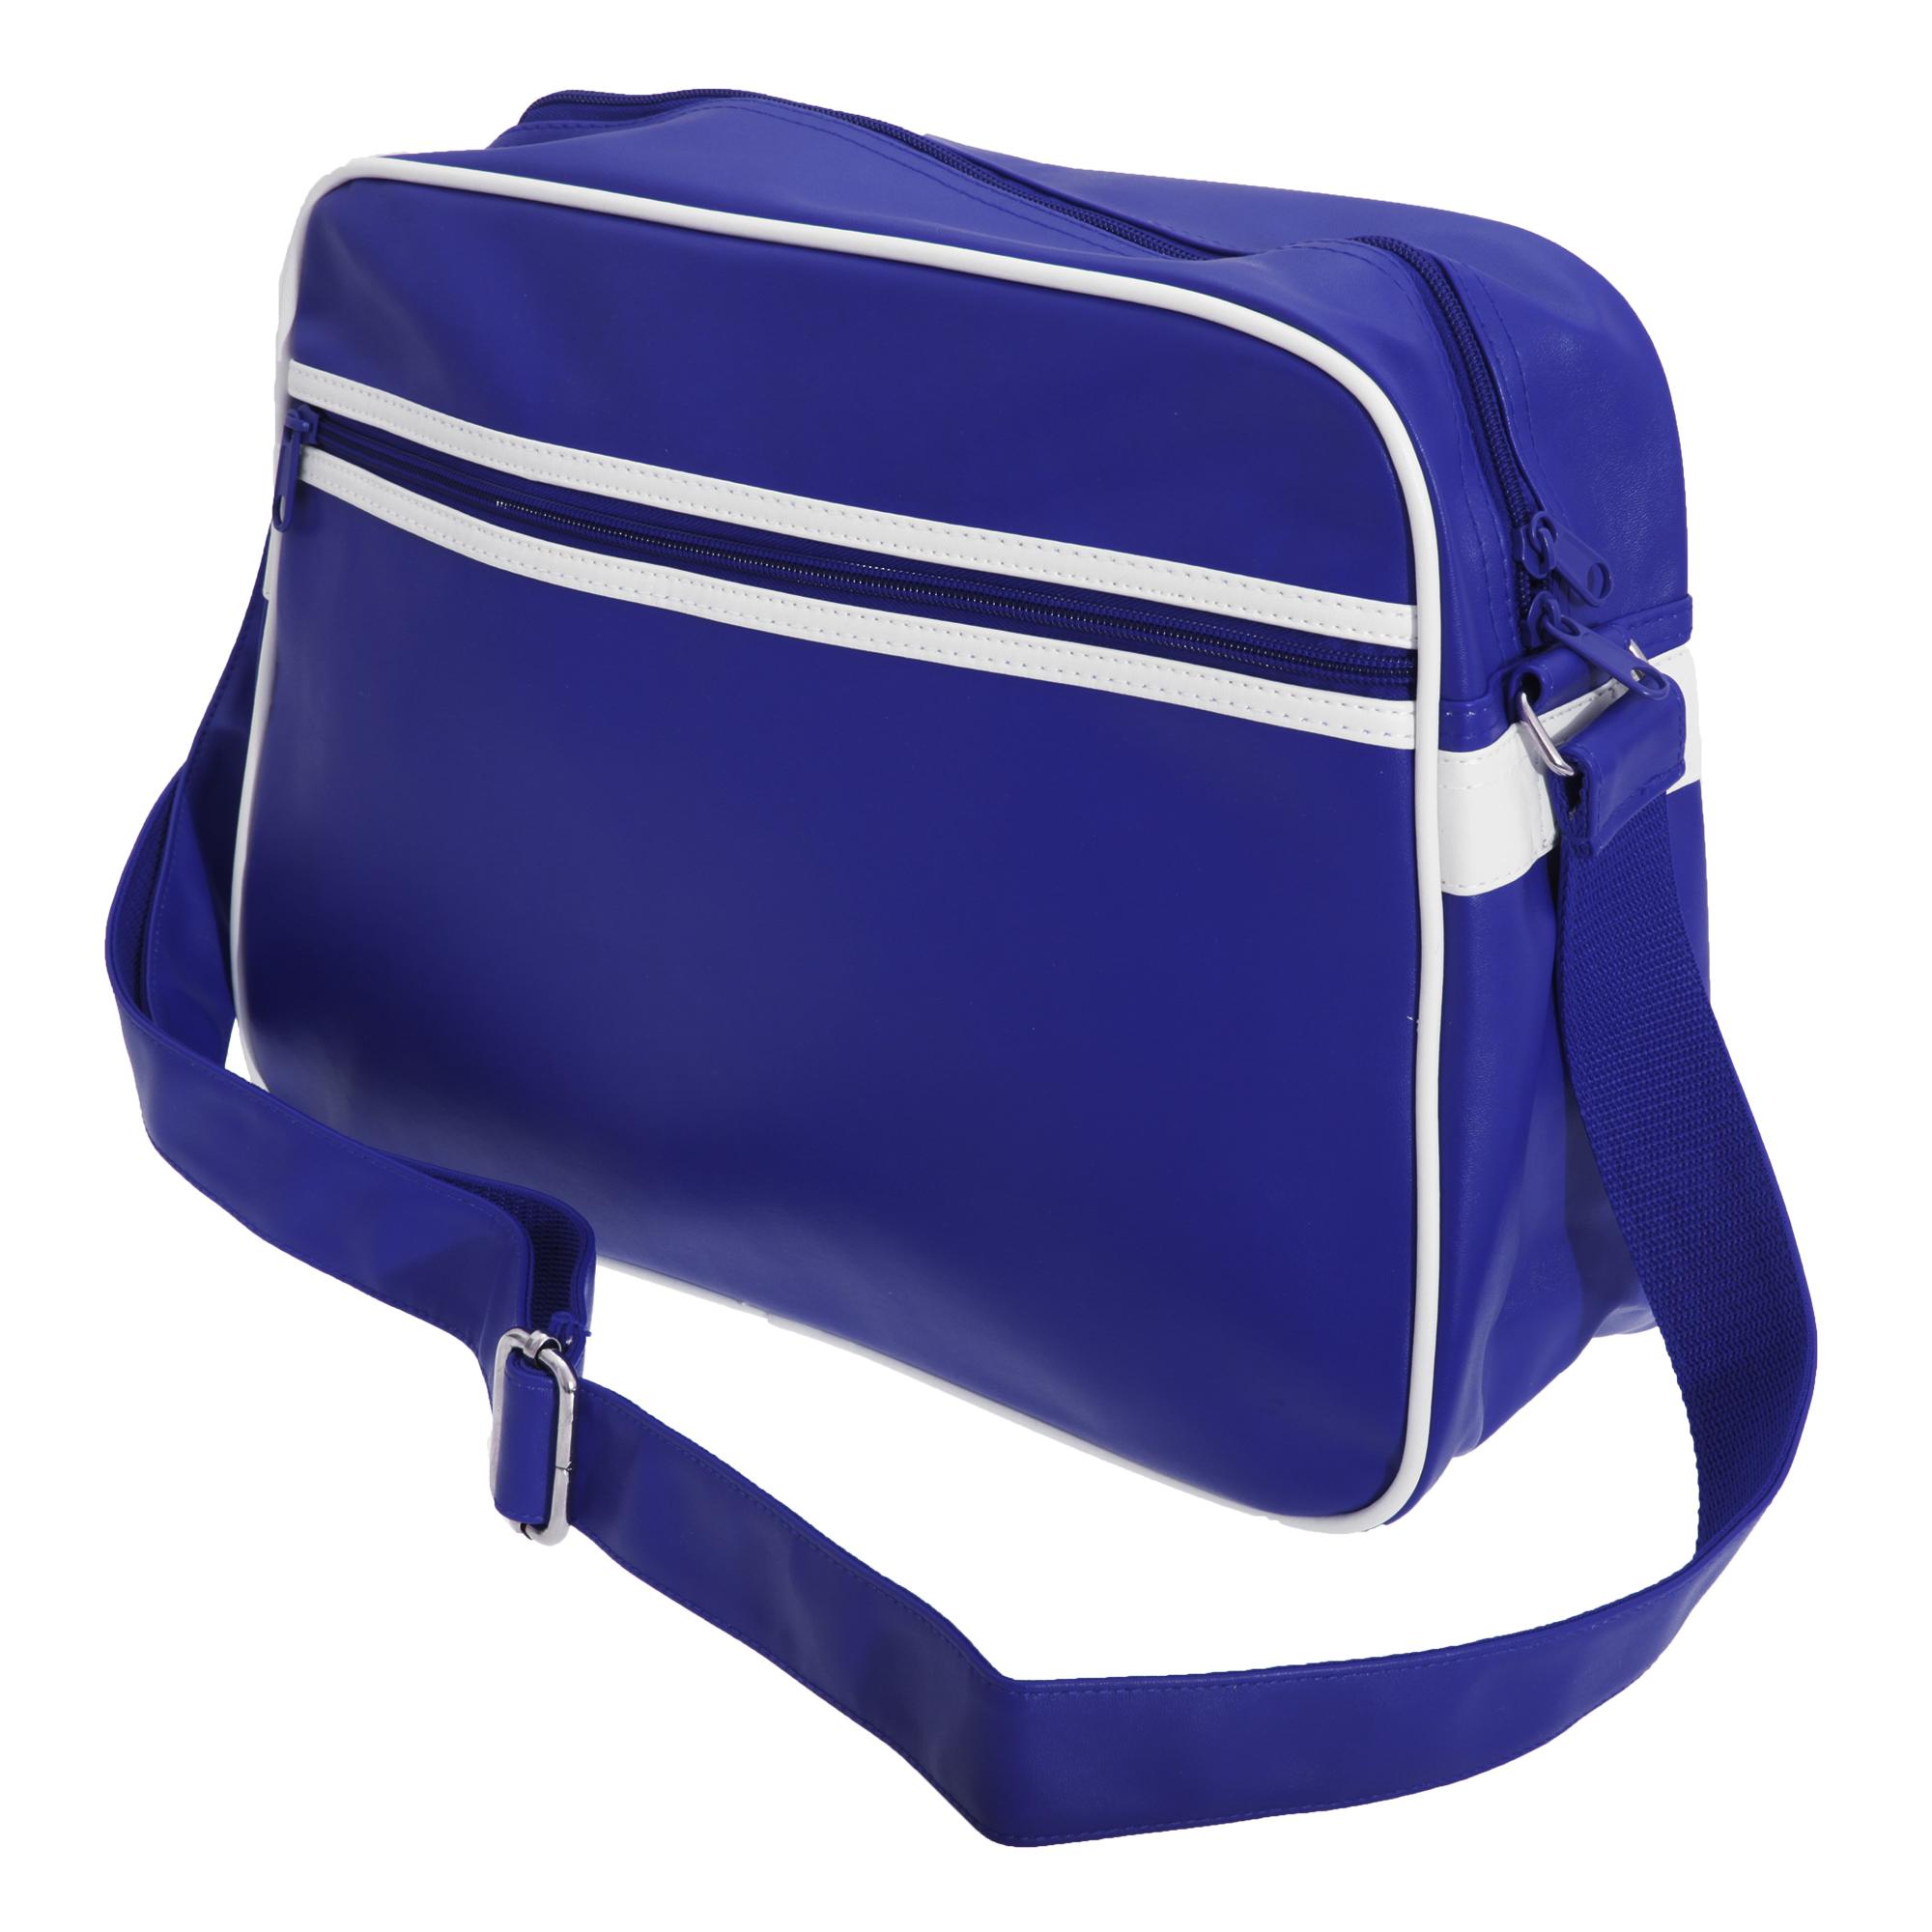 Bagbase Original Retro Shoulder Strap Messenger Bag (One Size) (French Navy/White)